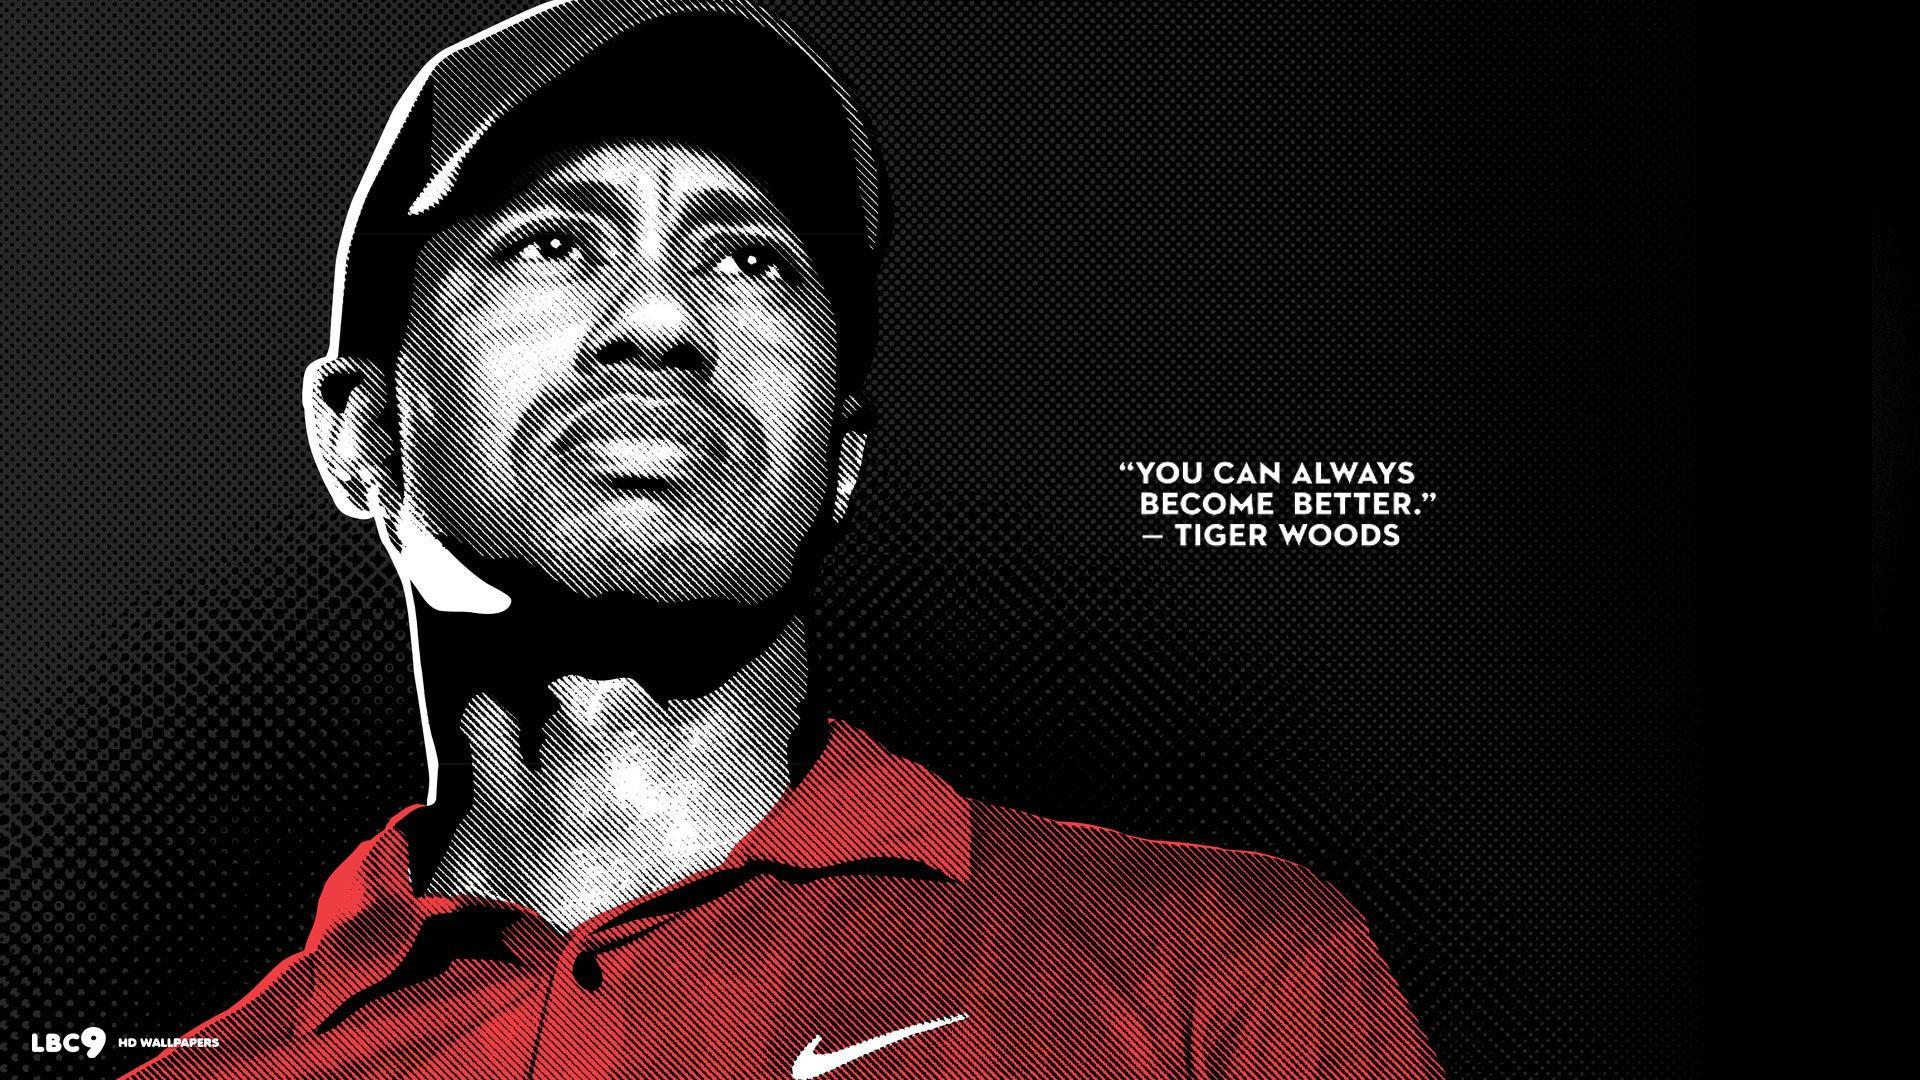 Tiger Woods Golf Quote | Desktop Wallpaper | #quotes